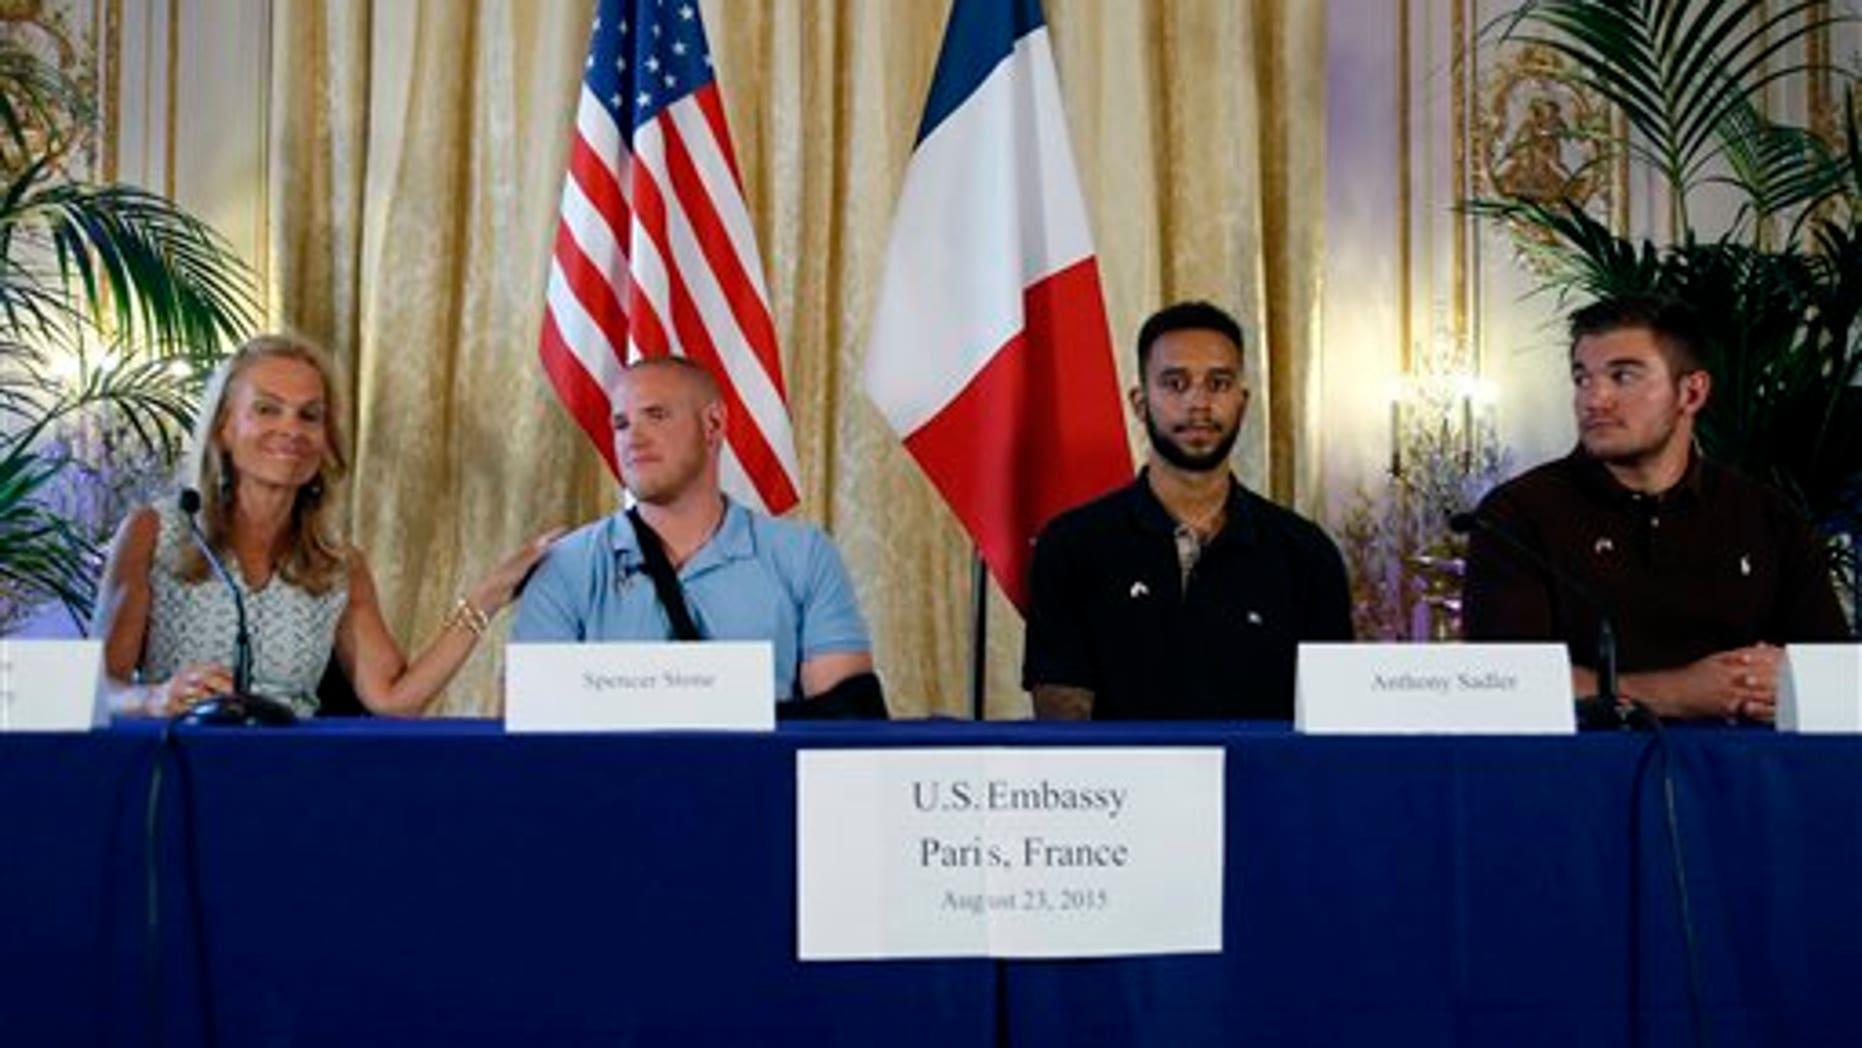 From left, U.S. Ambassador to France Jane D. Hartley, U.S. Airman Spencer Stone, Anthony Sadler, and National Guardsman Alek Skarlatos at press conference in Paris, France, Sunday, Aug. 23, 2015.. (AP Photo/Francois Mori)